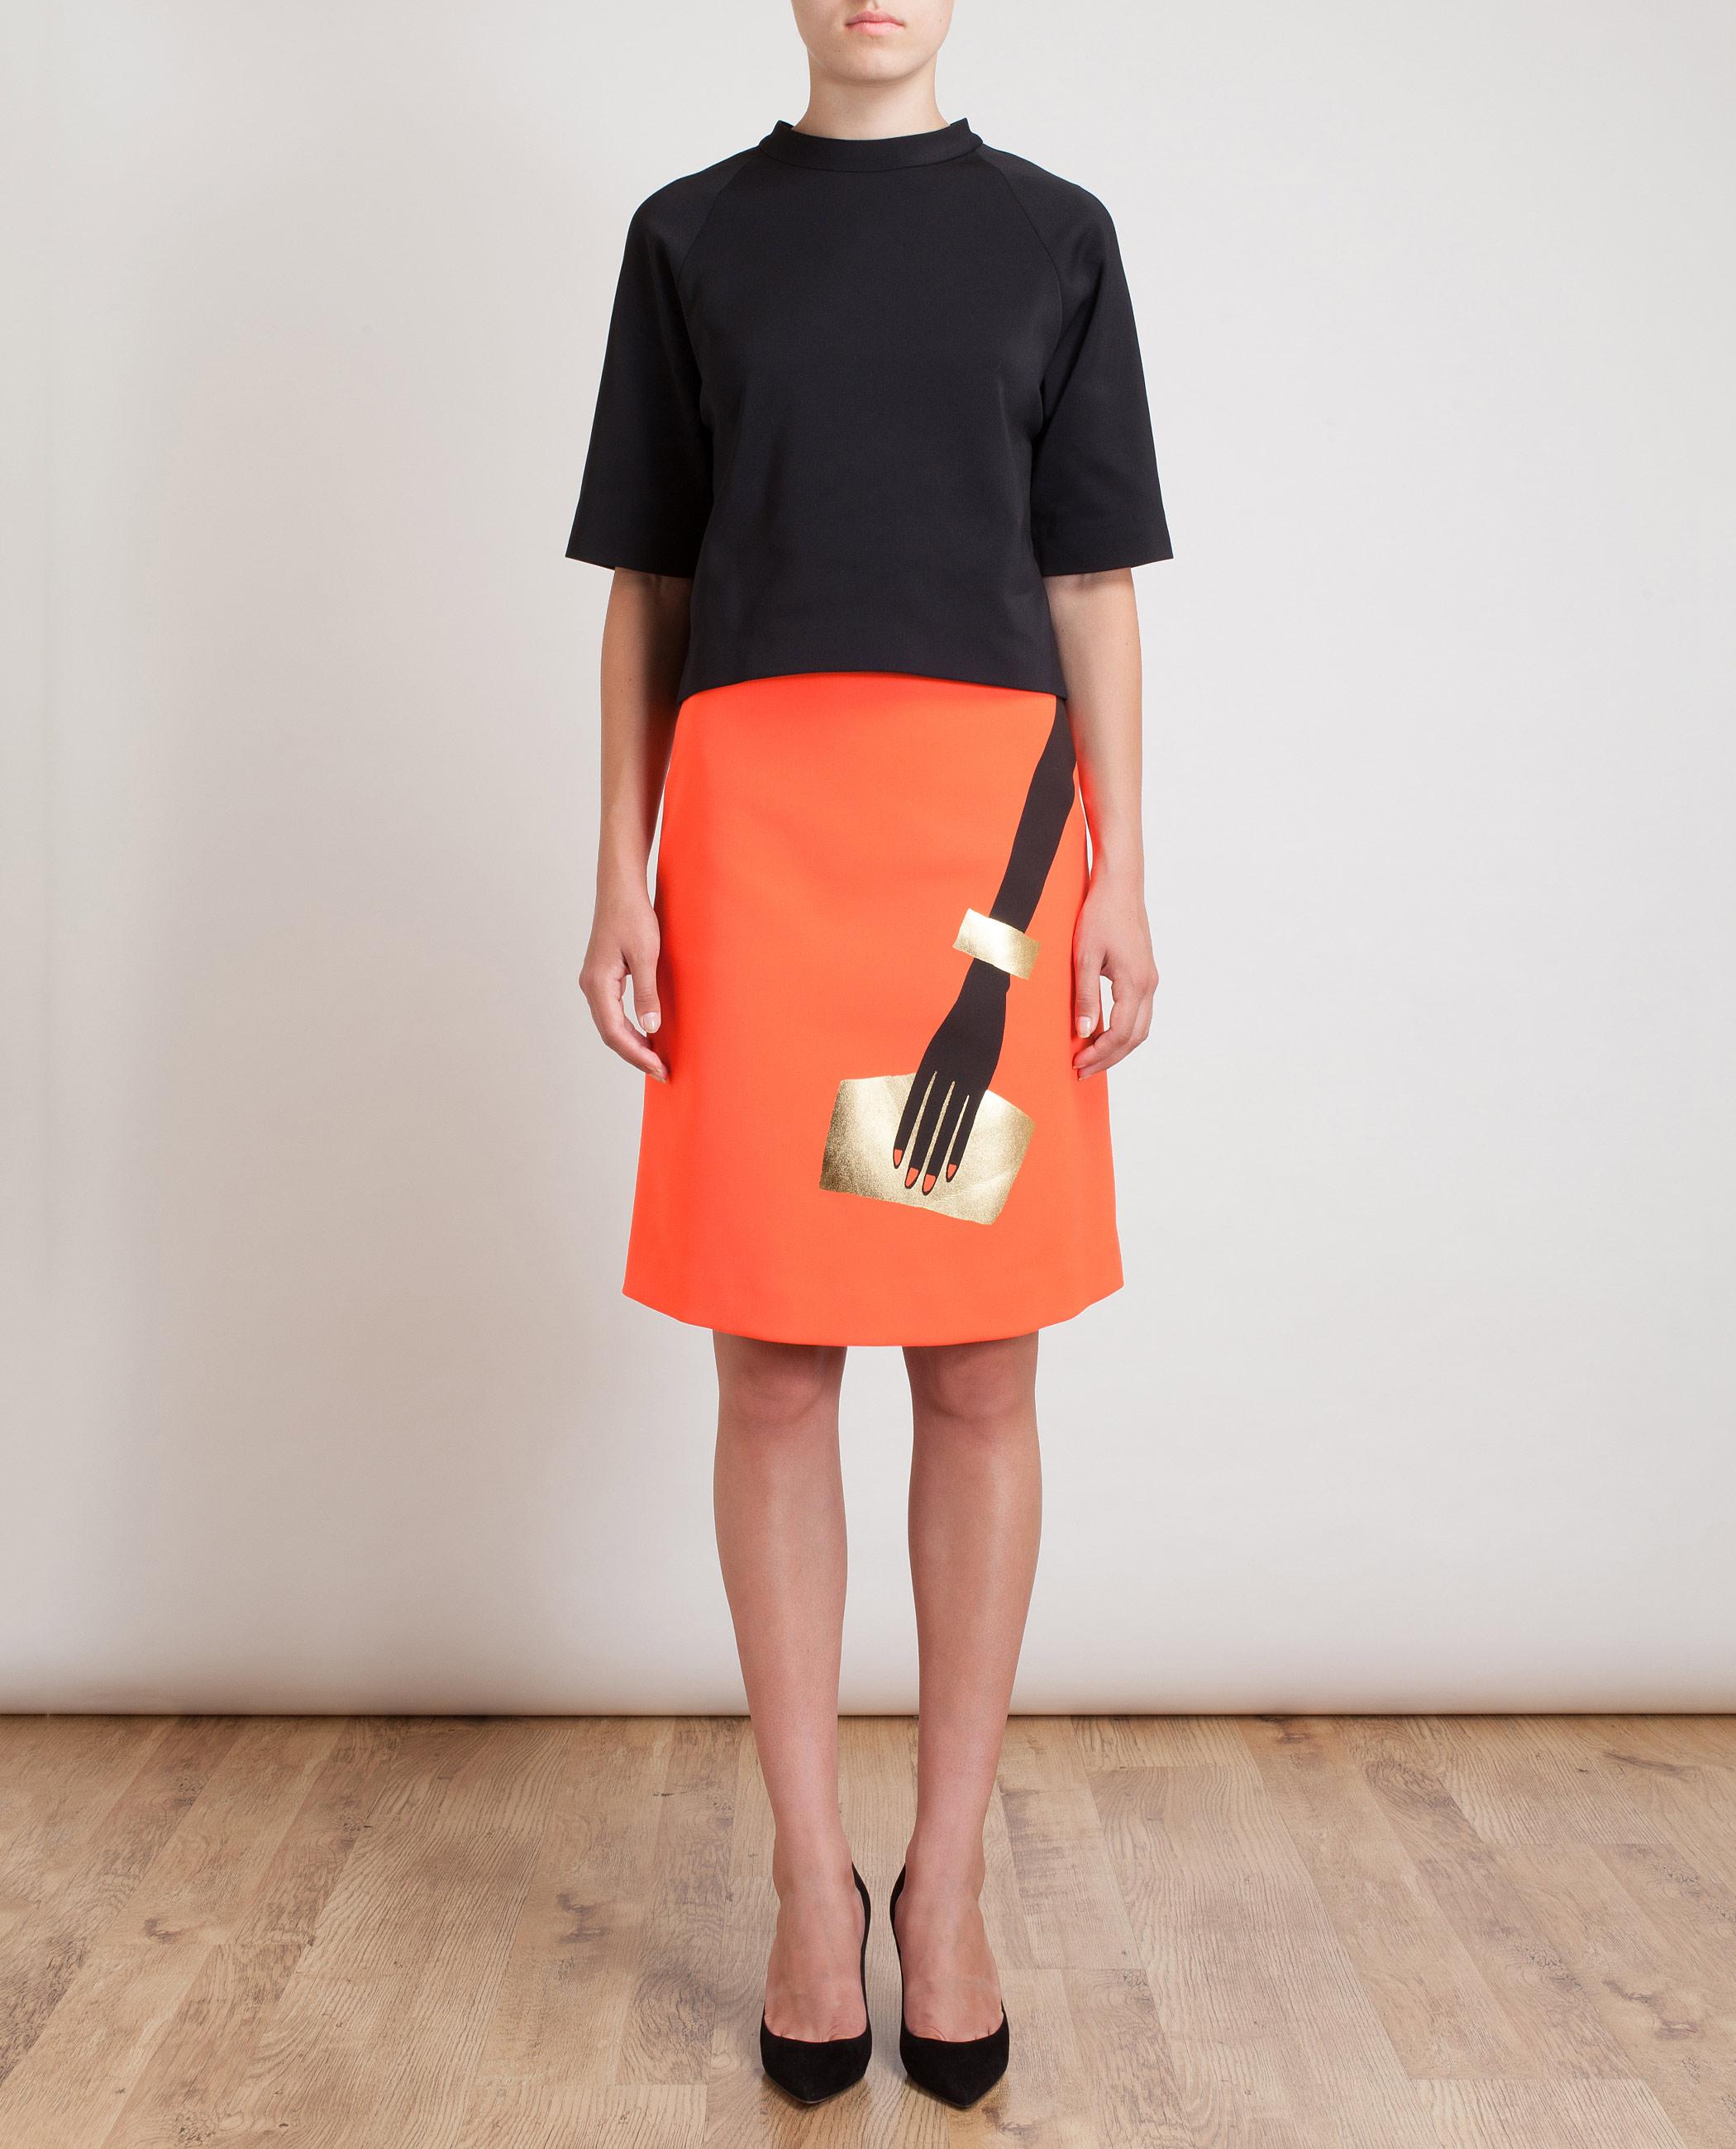 OSMAN Hand Print Skirt in Orange